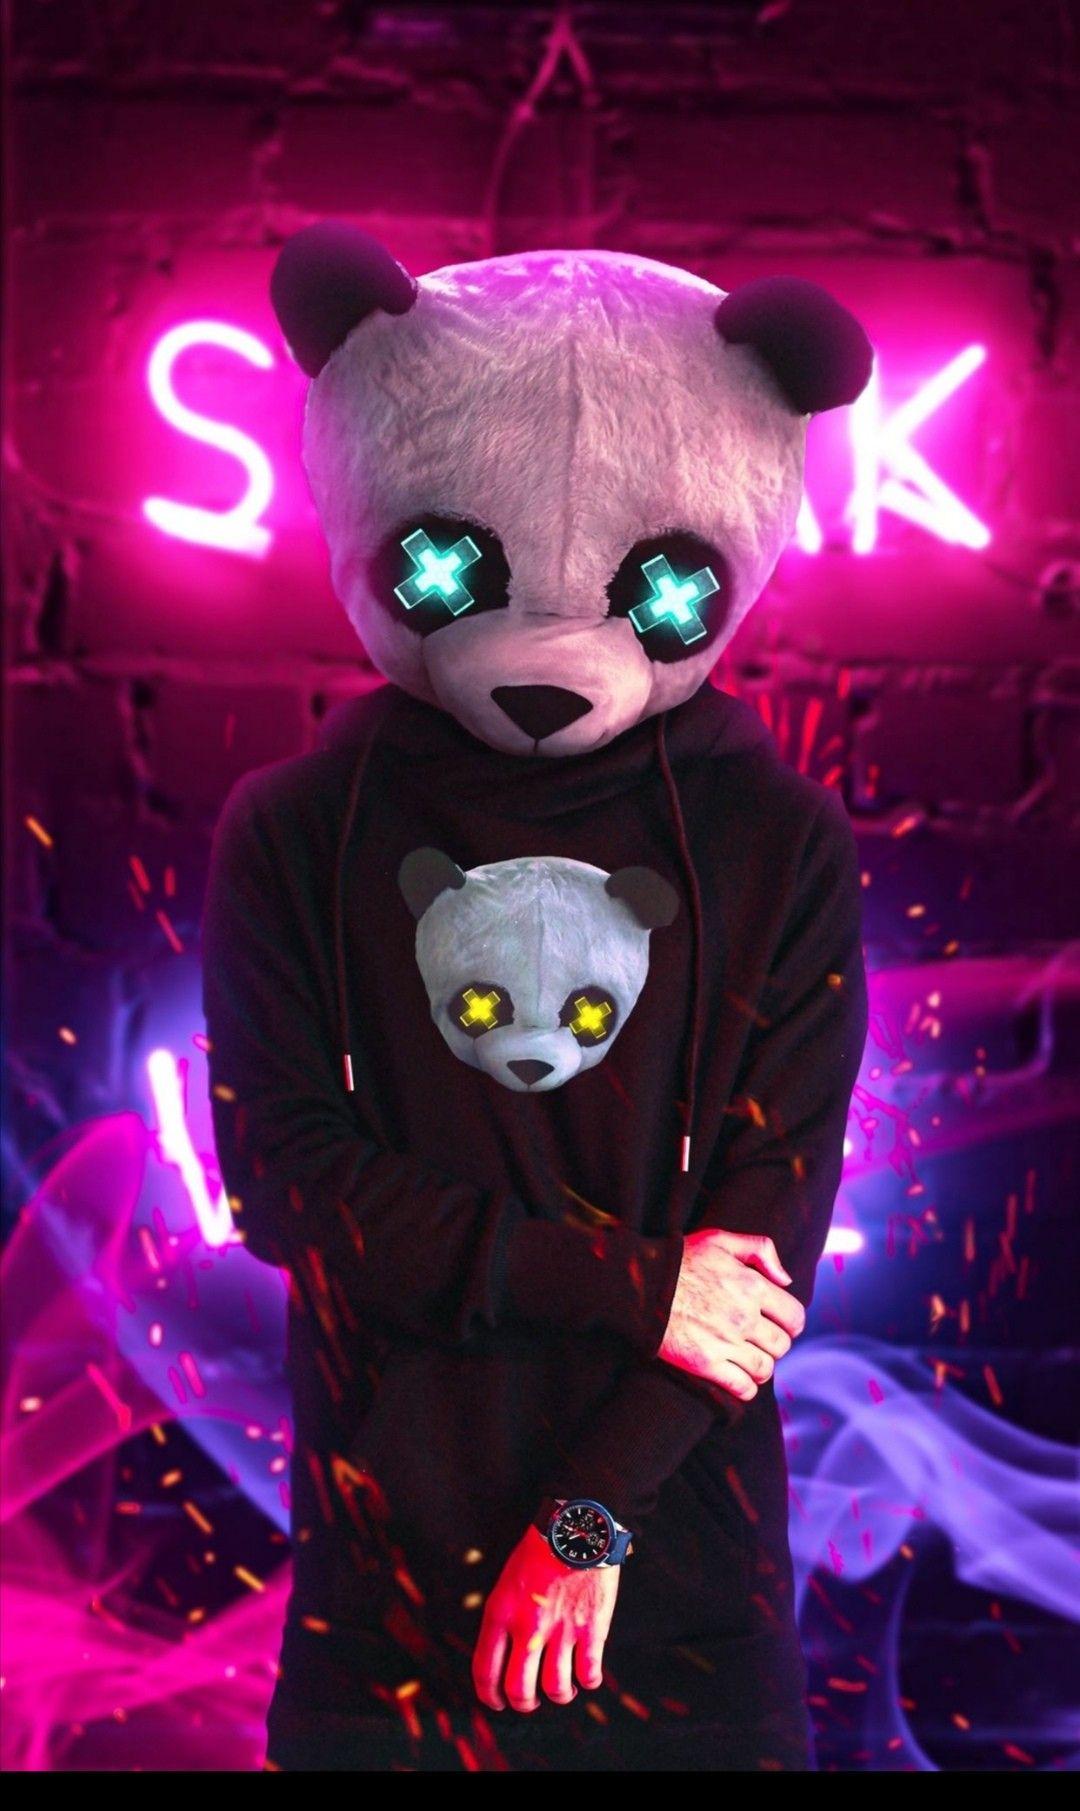 Pin by Rifqi on Boy in 2020 | Panda art, Wallpaper iphone ...